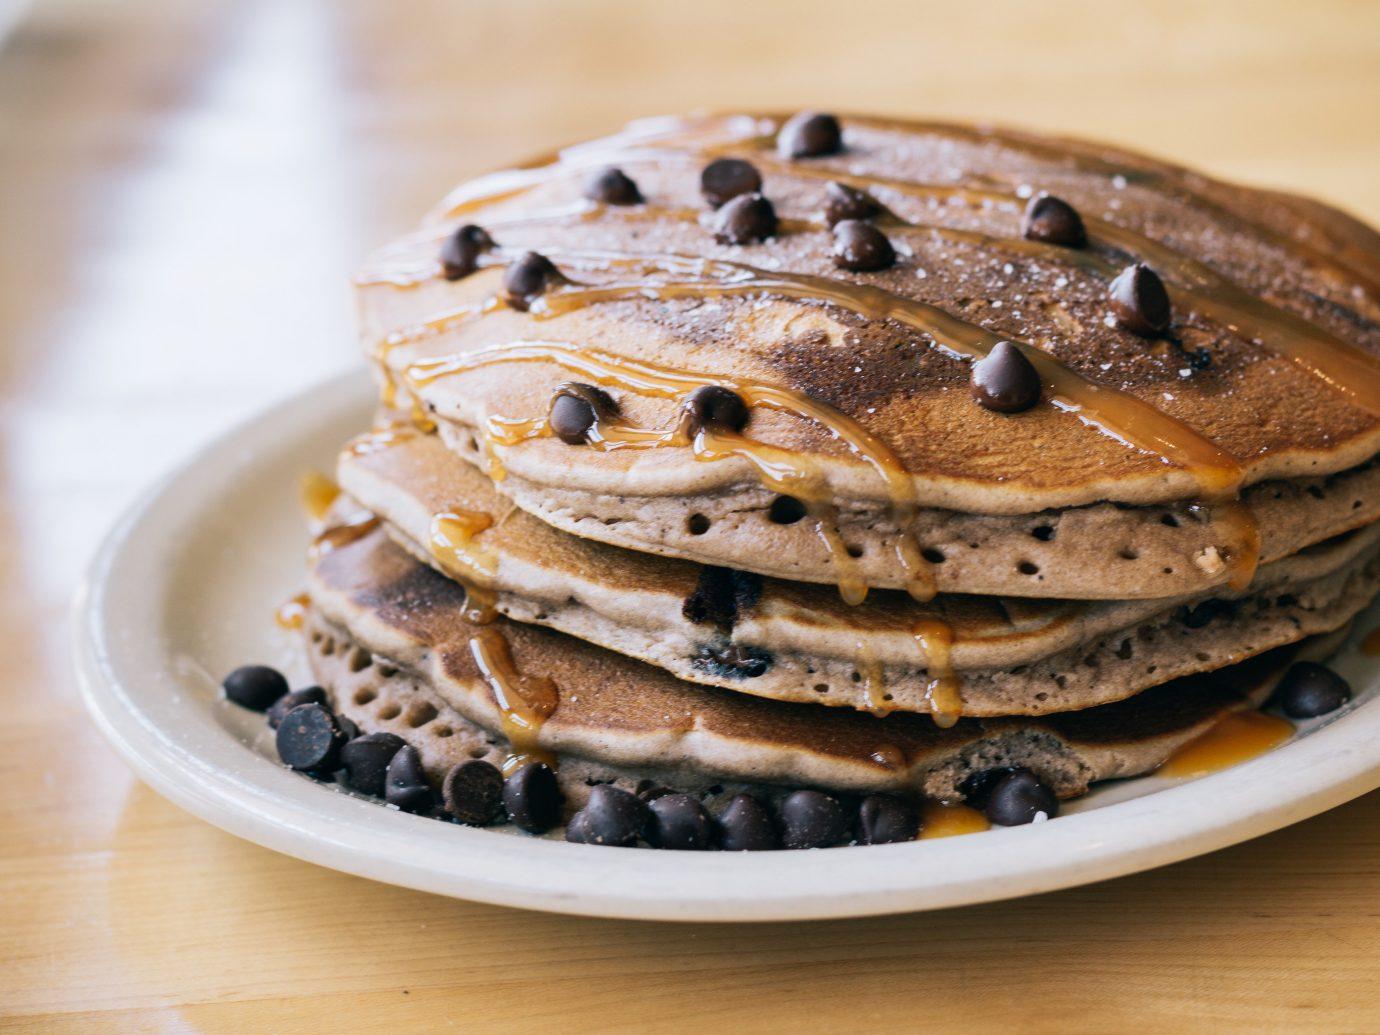 Food + Drink plate table dish food meal indoor breakfast pancake produce waffle dessert sliced stack